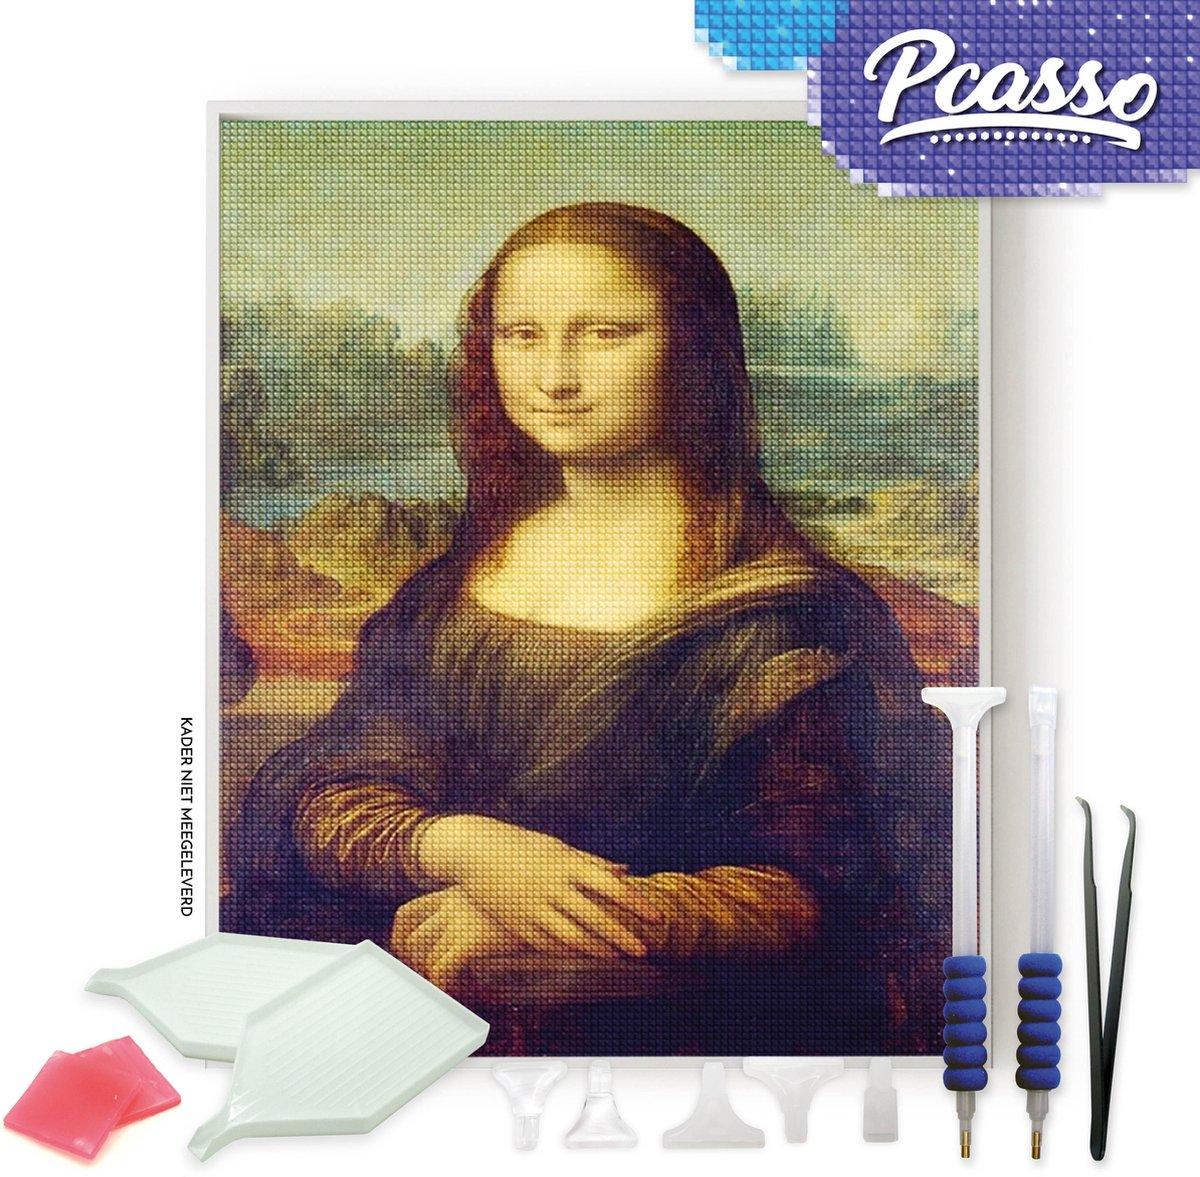 Pcasso ® Monelisa - Diamond Painting - Incl. Veel Diamond Painting Accessoires - Diamond Painting Kinderen - Diamond Painting Dieren - Diamond painting volwassenen - 30x40 CM